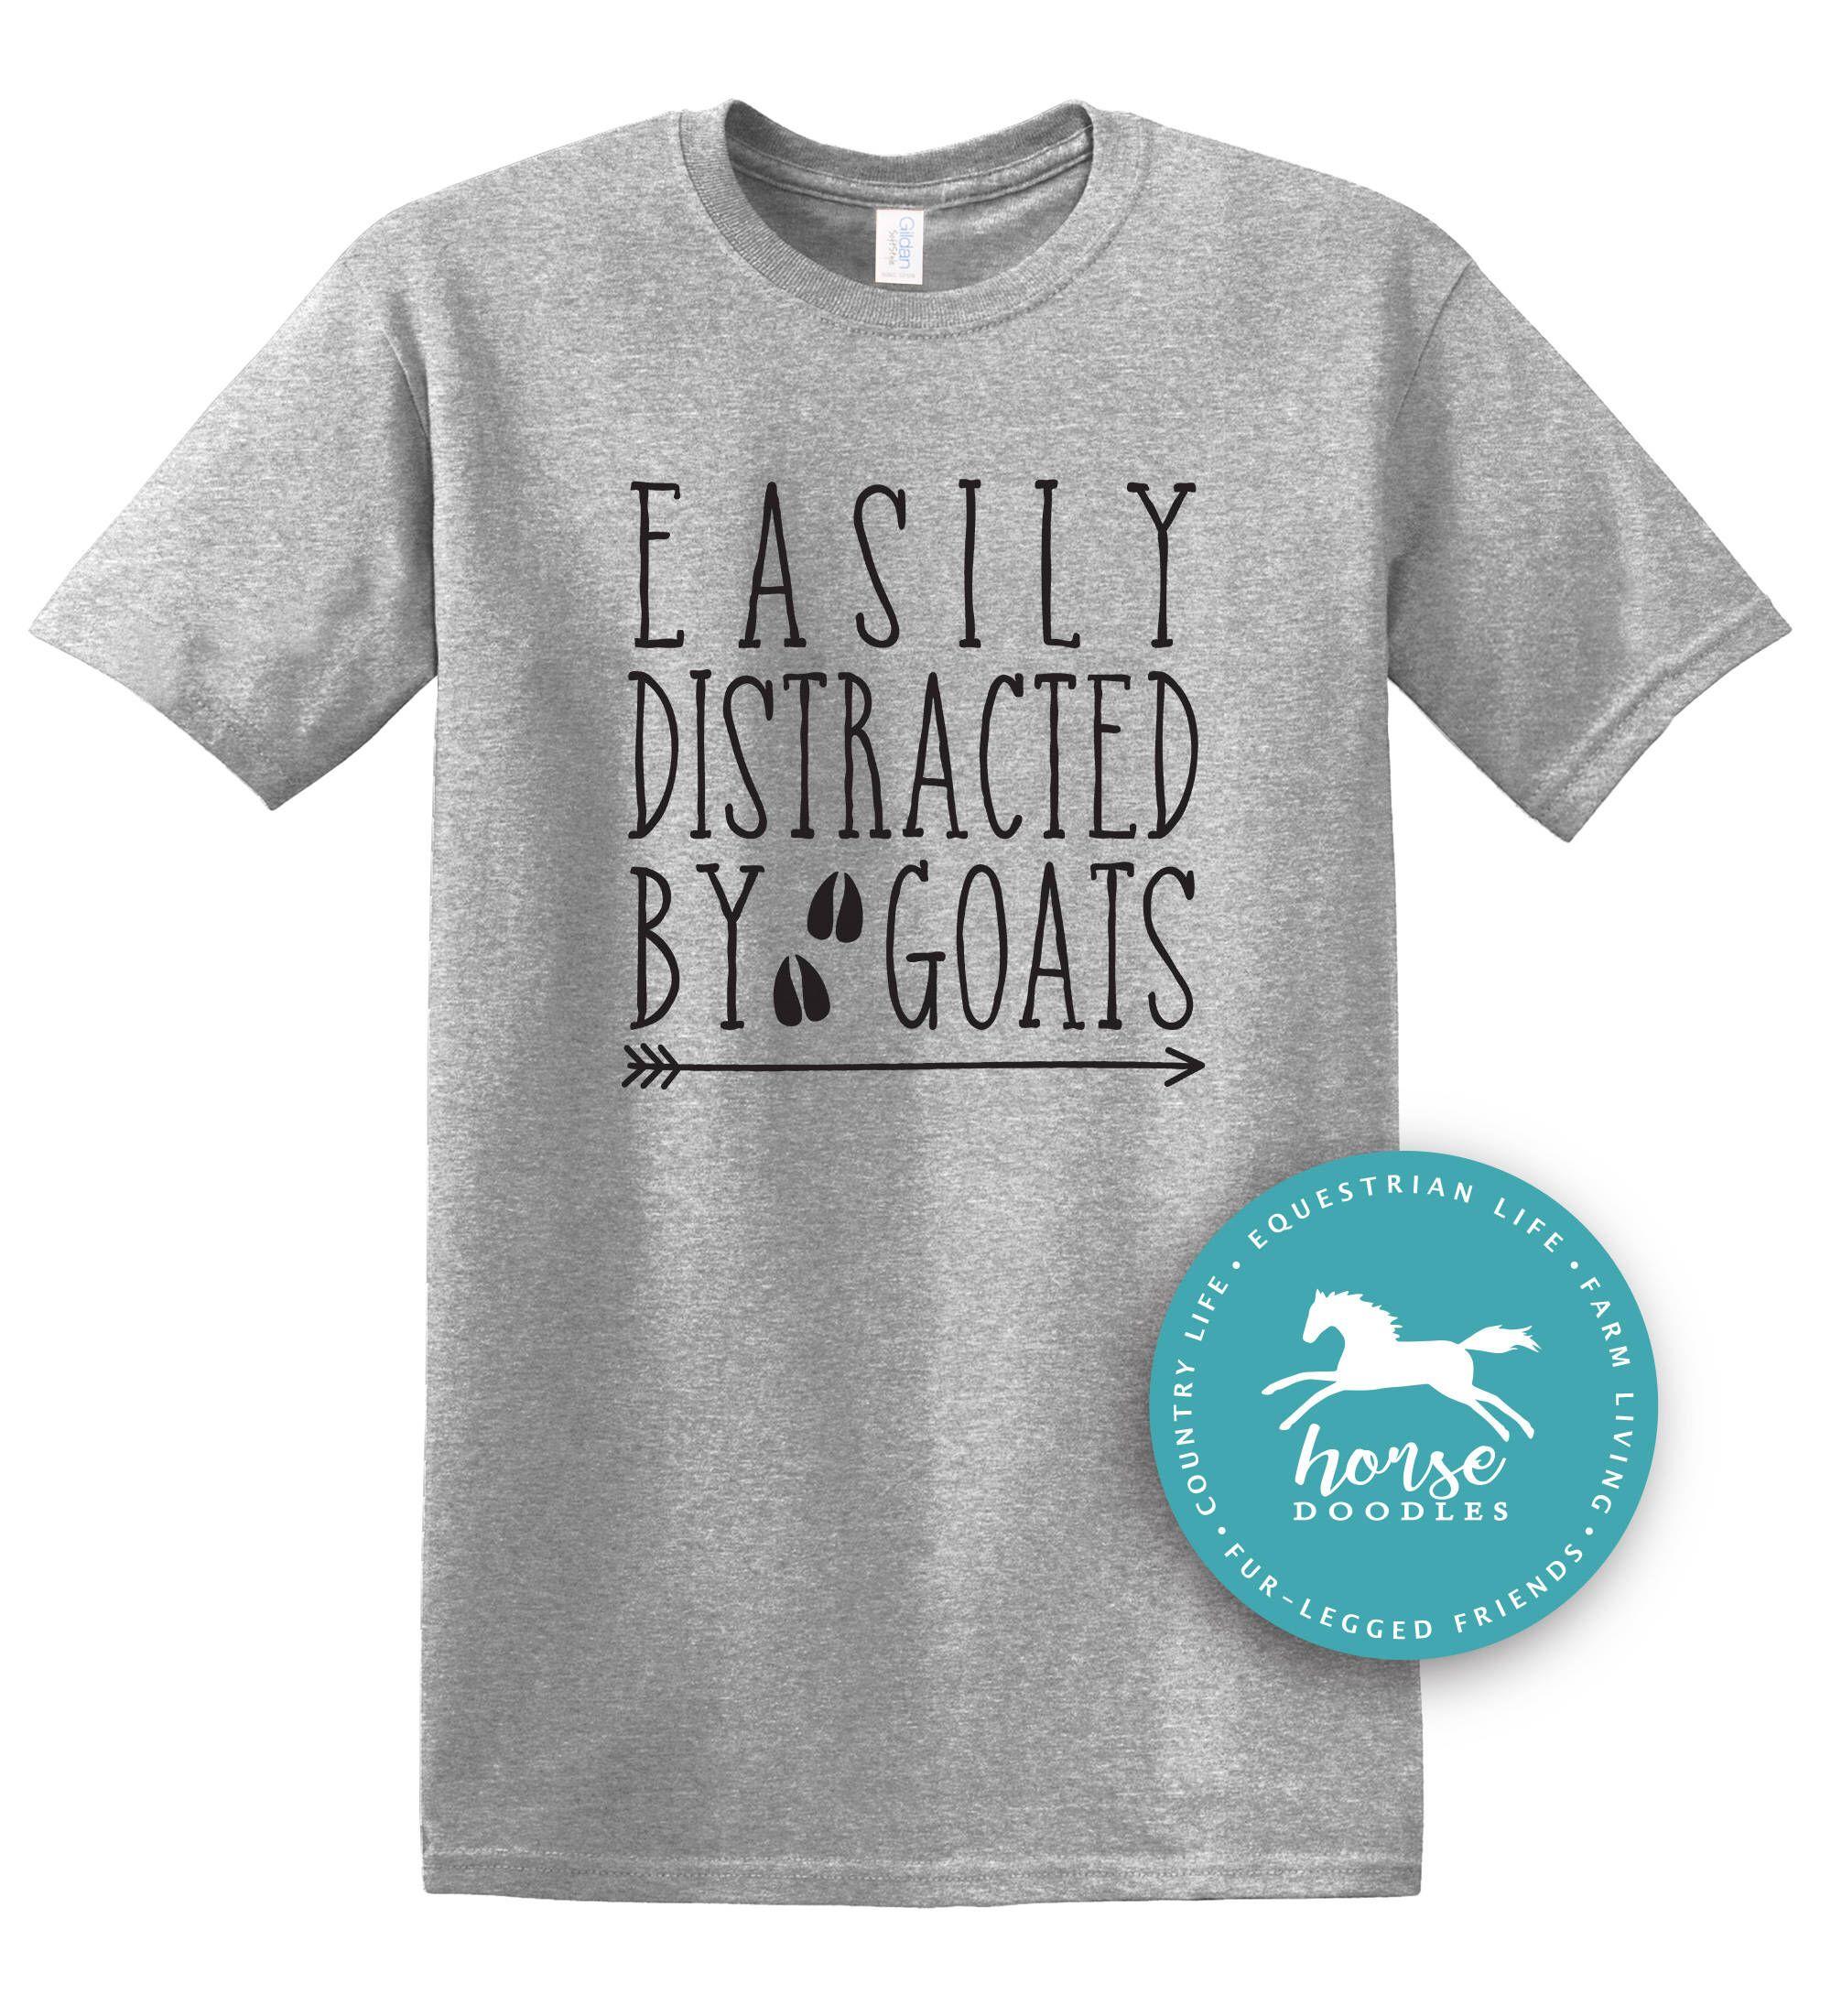 538f74ca Easily Distracted By Goats   Barn Life   Farm Girl   Farm T Shirt   Goat